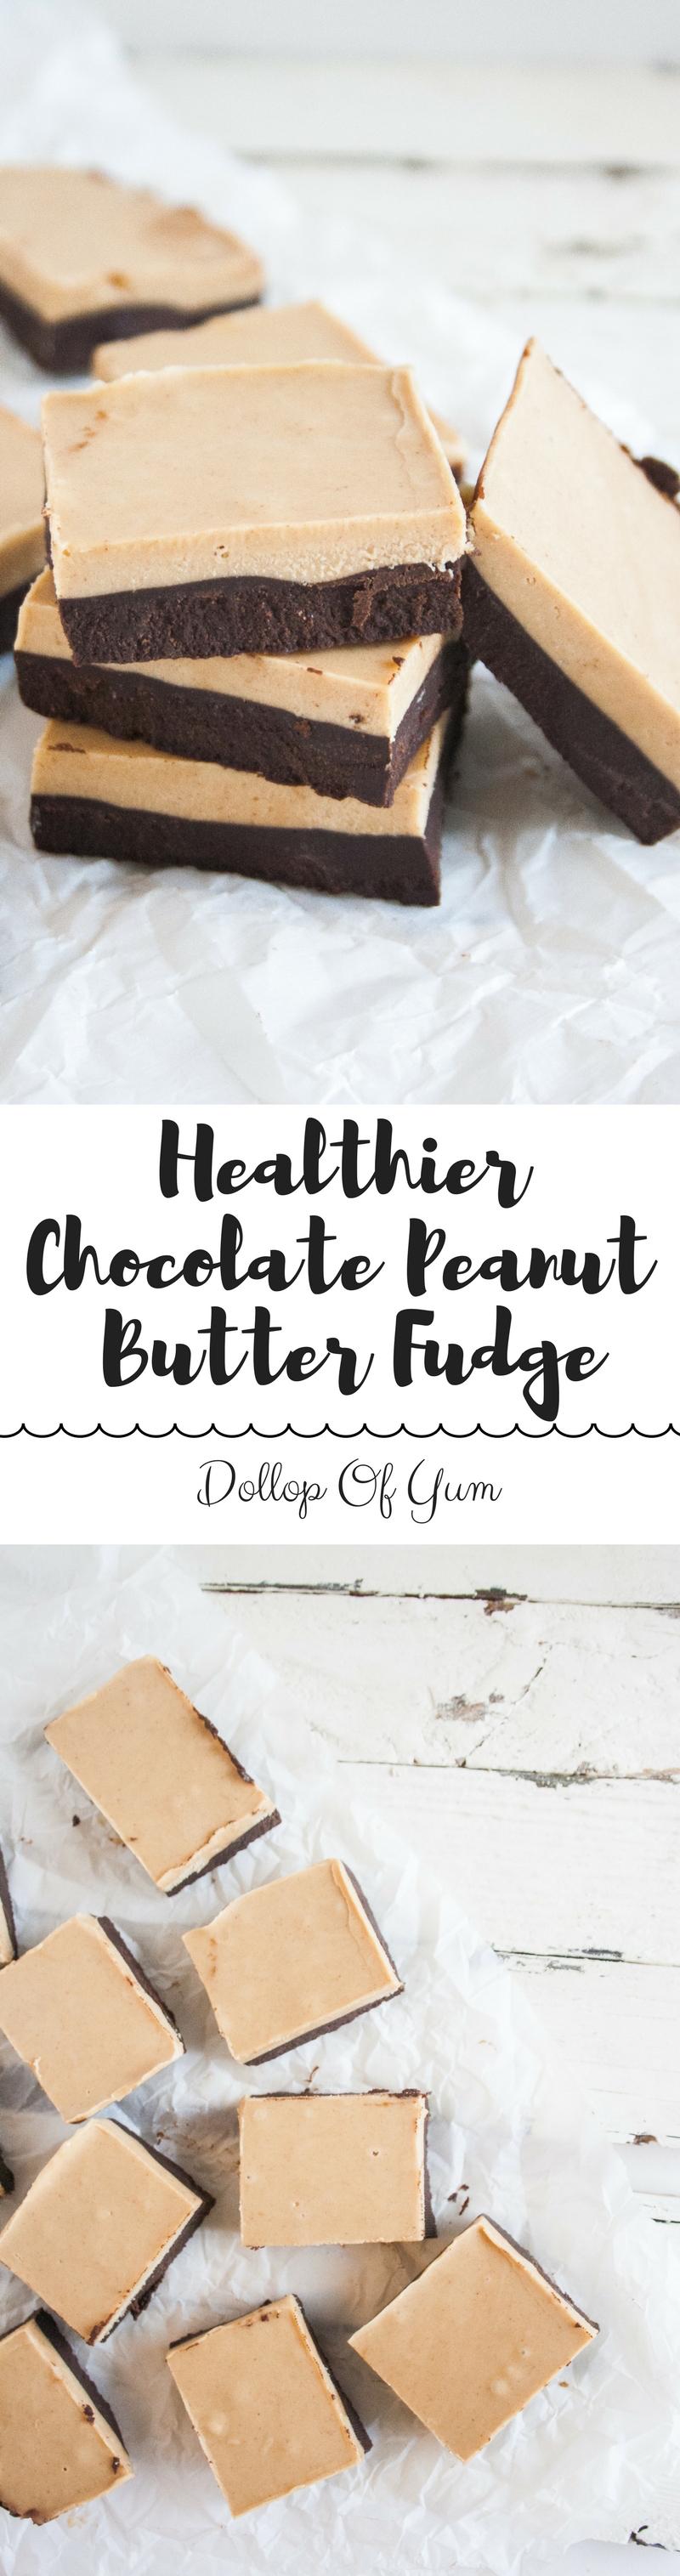 Healthier Chocolate Peanut Butter Fudge